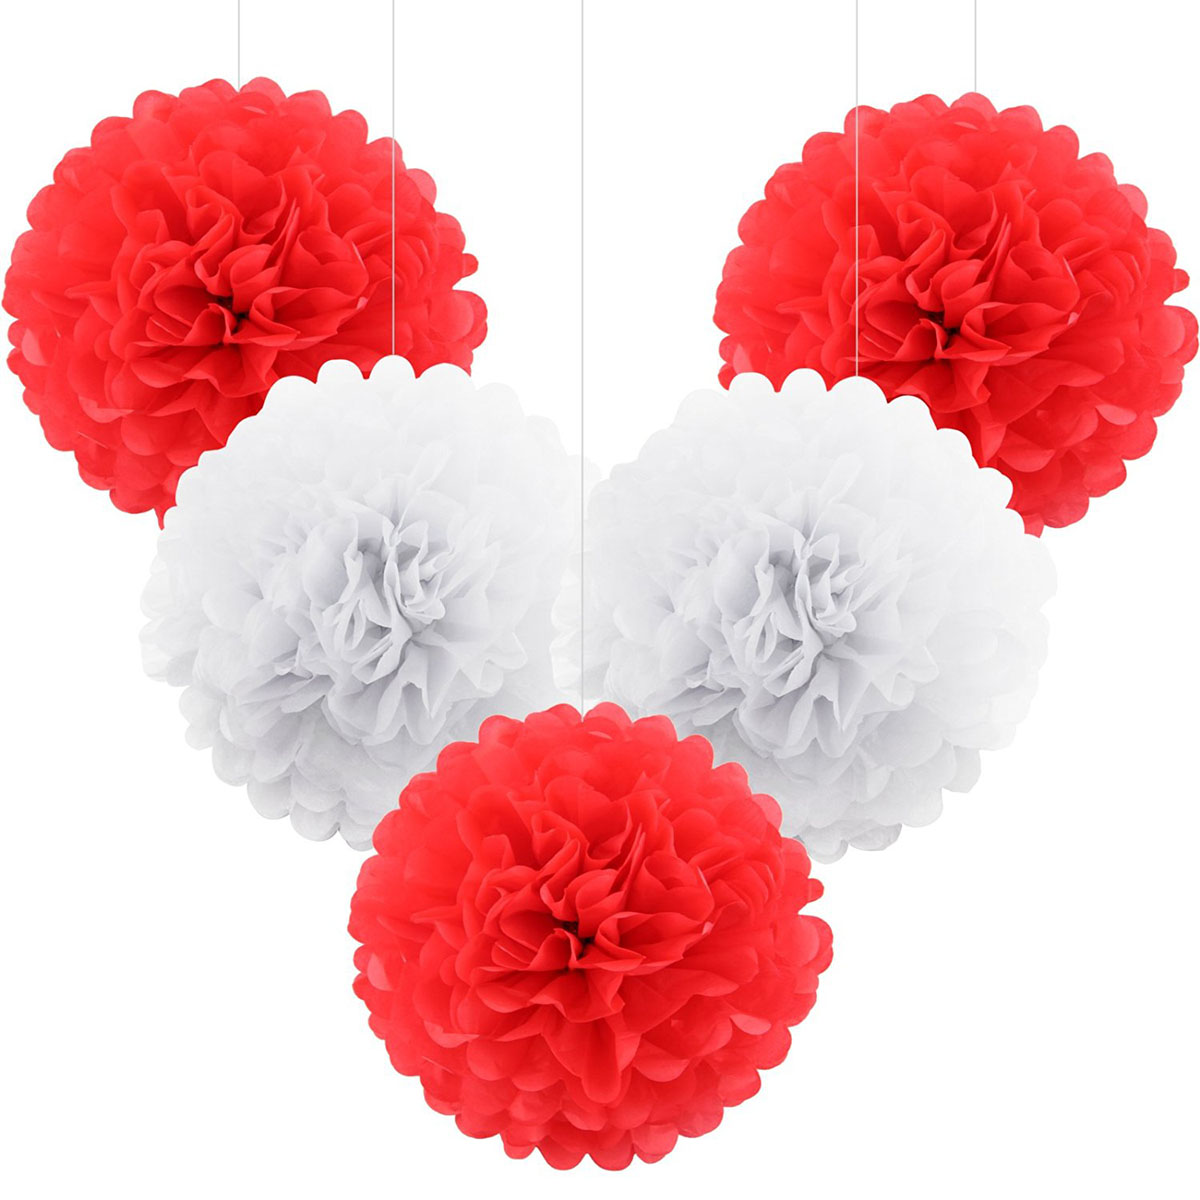 5pcs Tissue Paper Pom Poms Wedding Party Paper Pompom Flower For